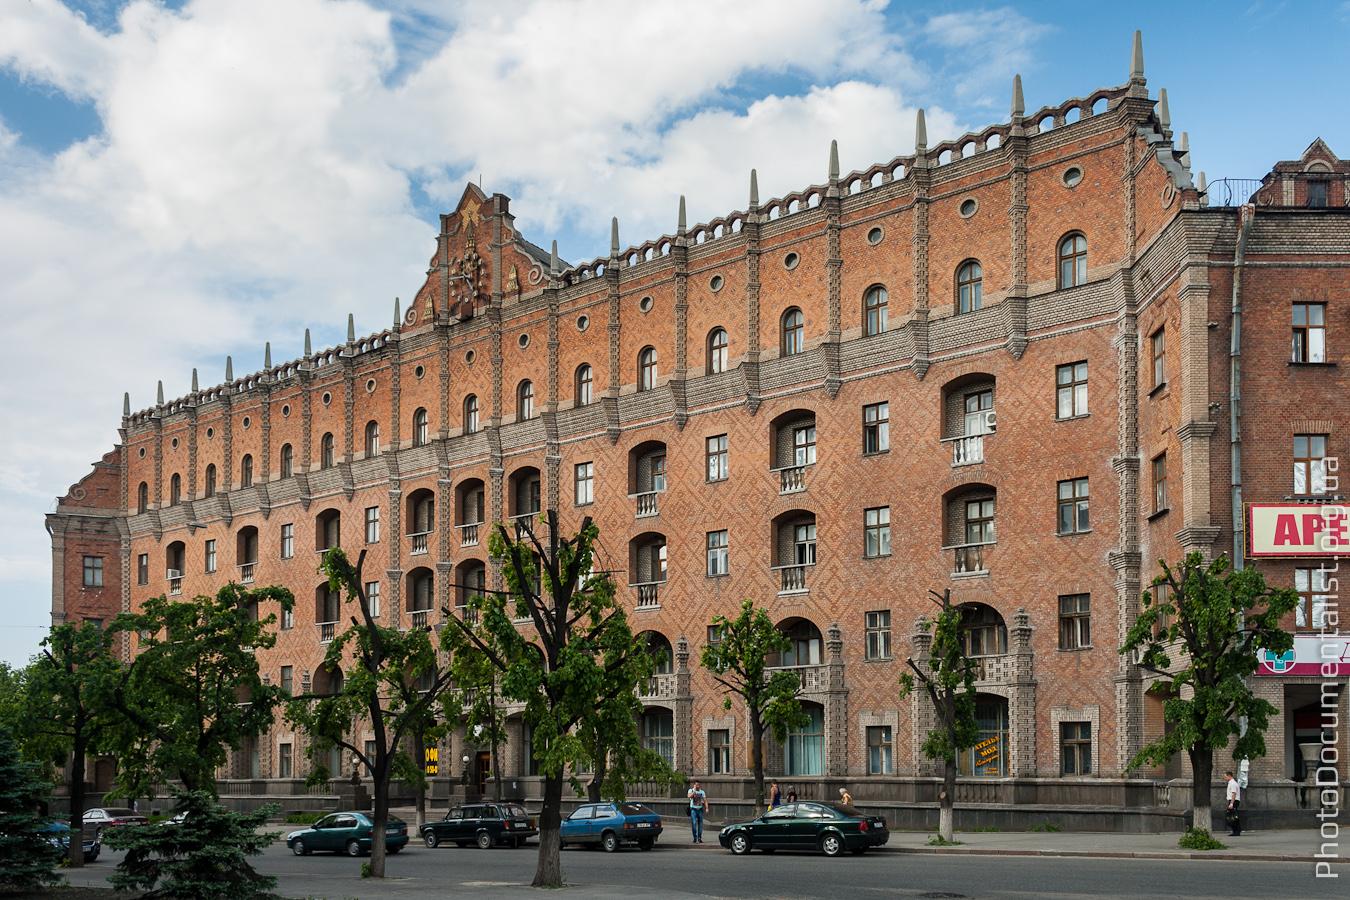 дом-музей даля луганск фото